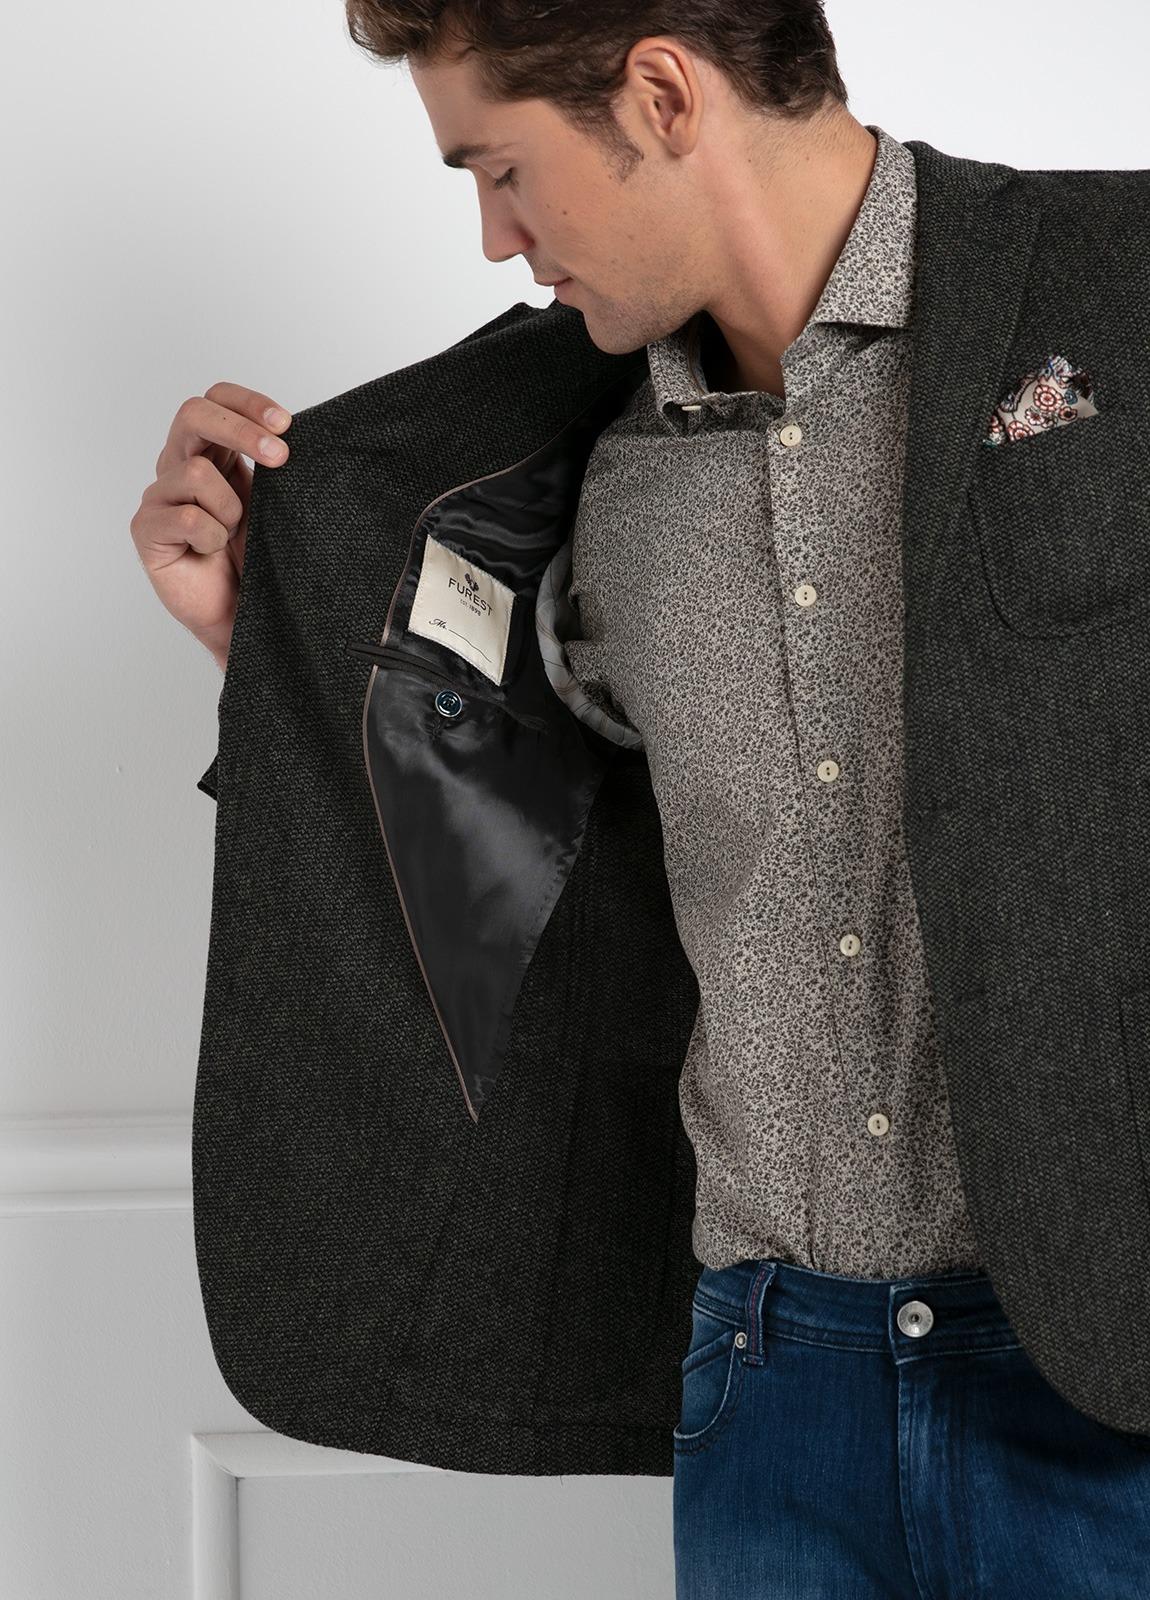 Americana SOFT JACKET Slim Fit, tejido textura color verde oscuro. 97% Lana, 3% Cashmere. - Ítem2